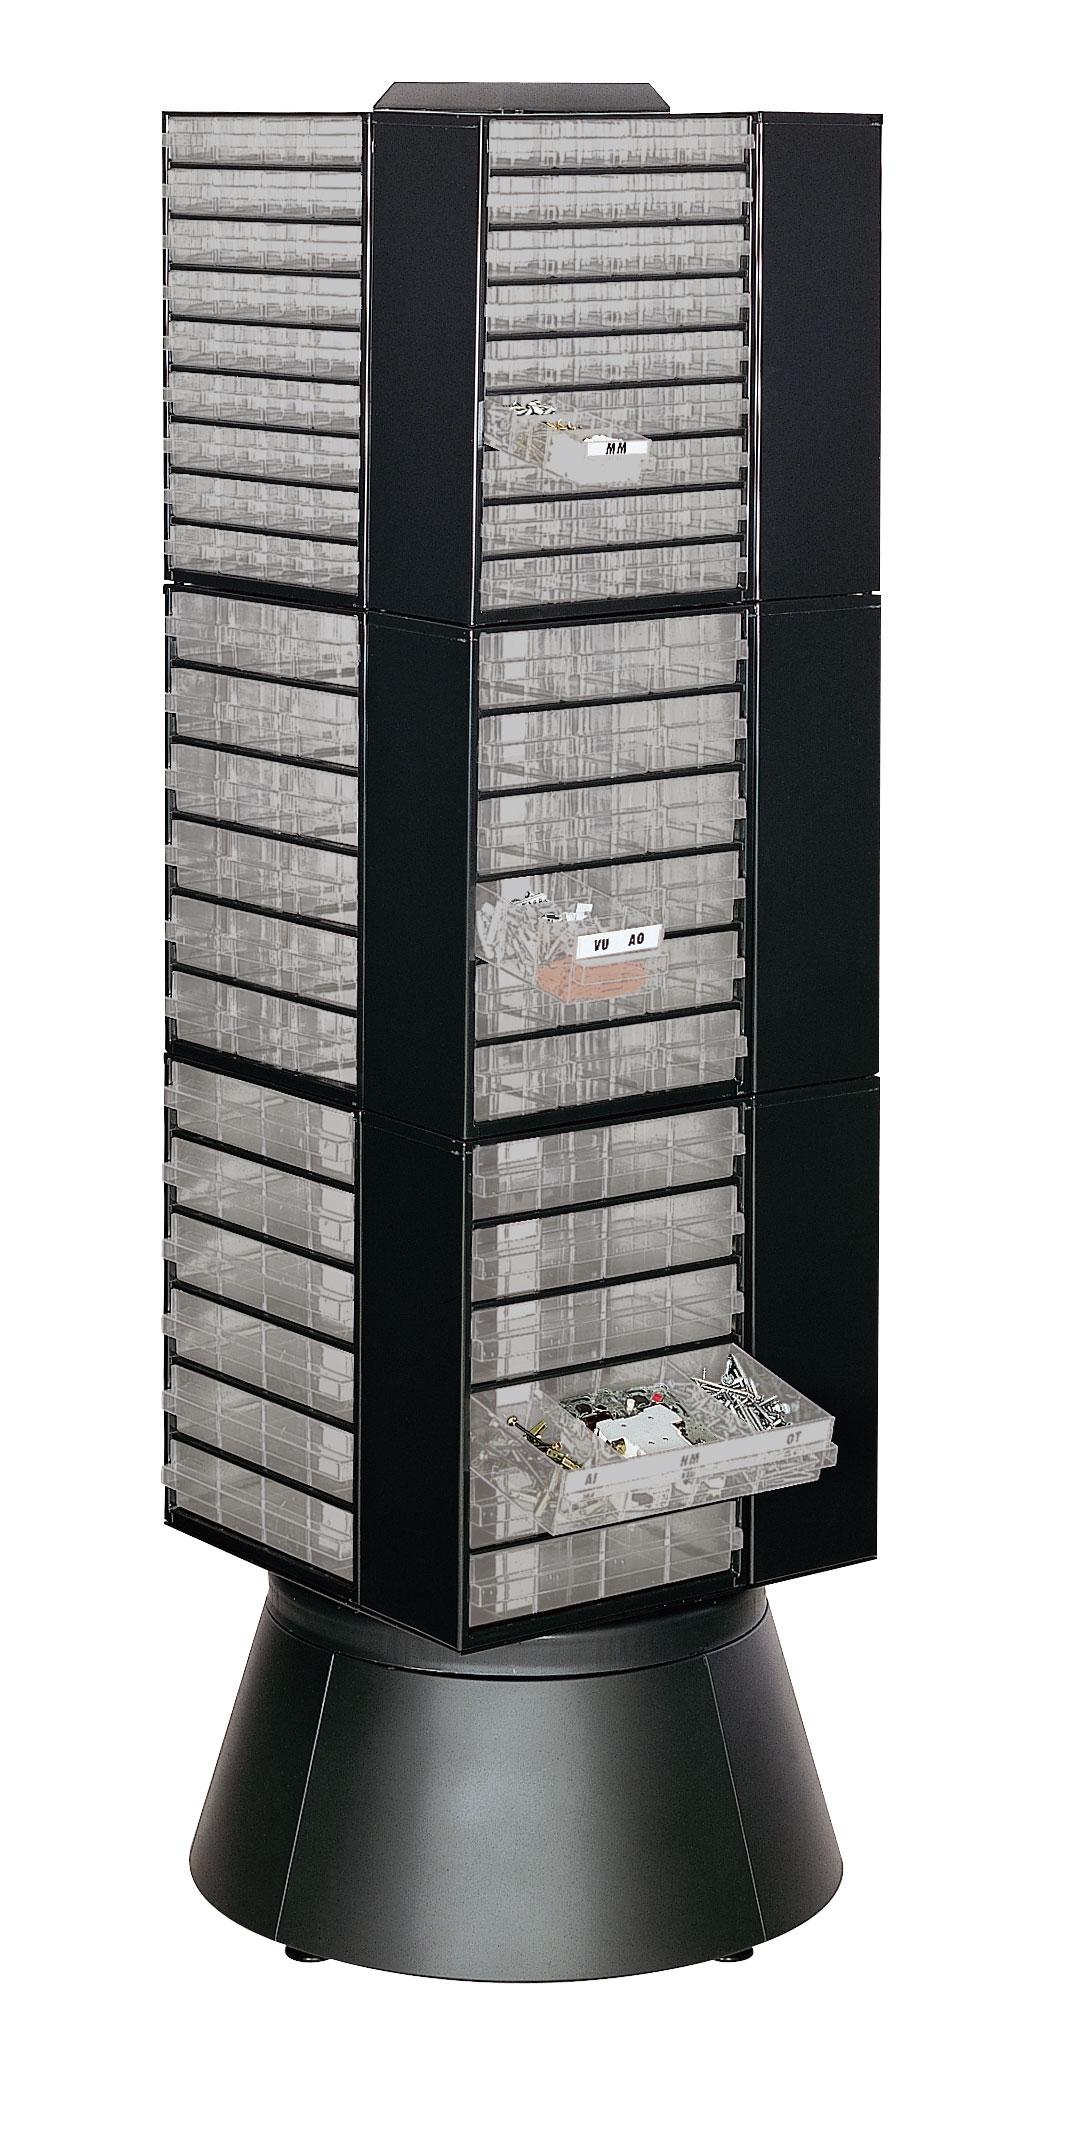 Colonne rotative avec 12 modules stockage tiroirs transparents